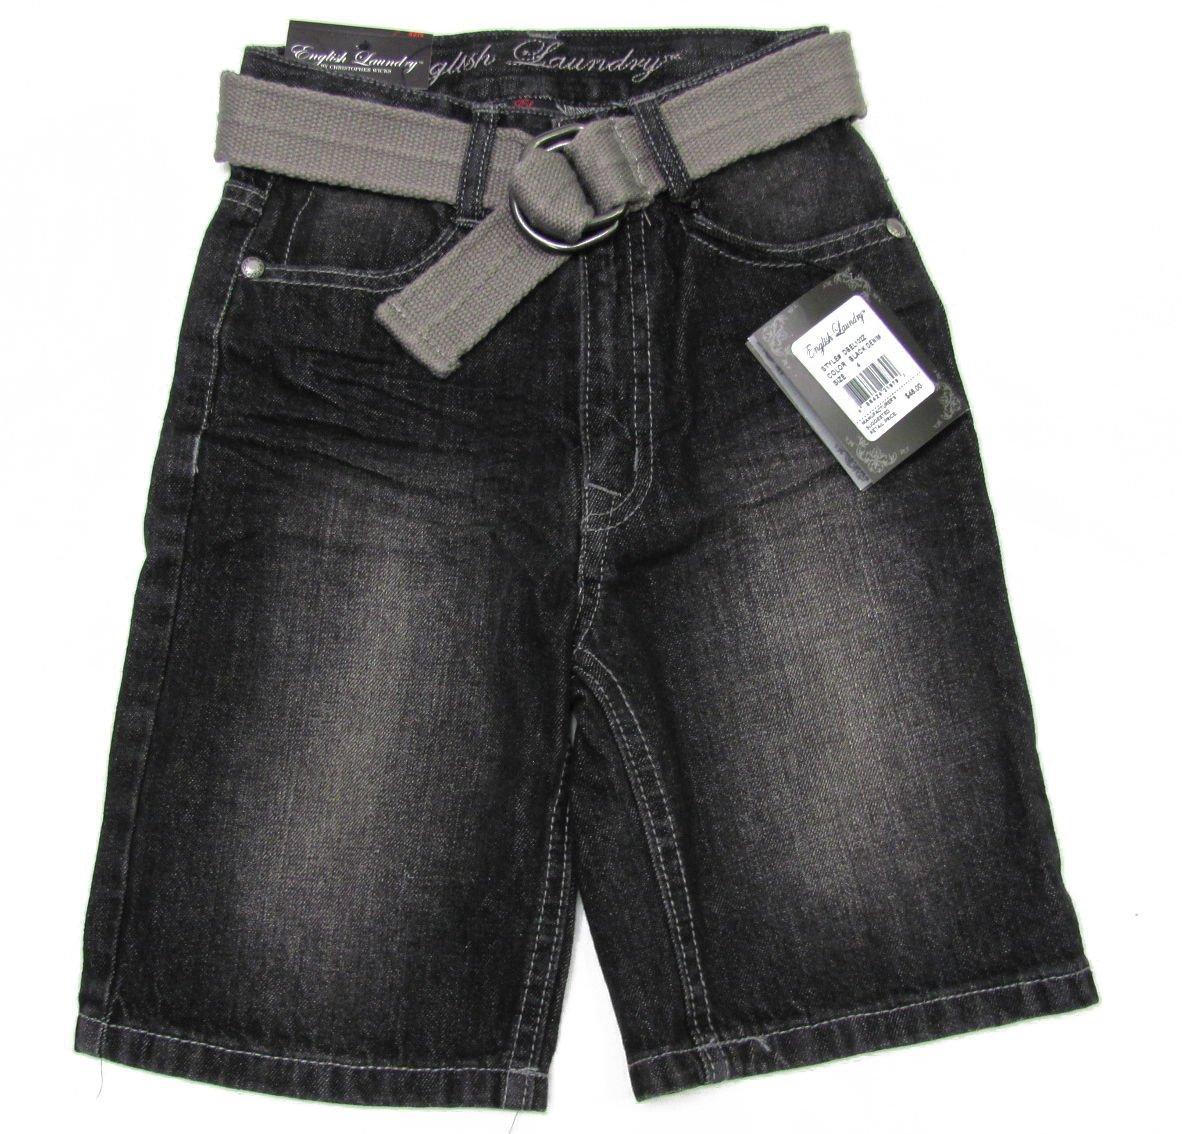 English Laundry Boys size 6 Black Jean Shorts with Belt New